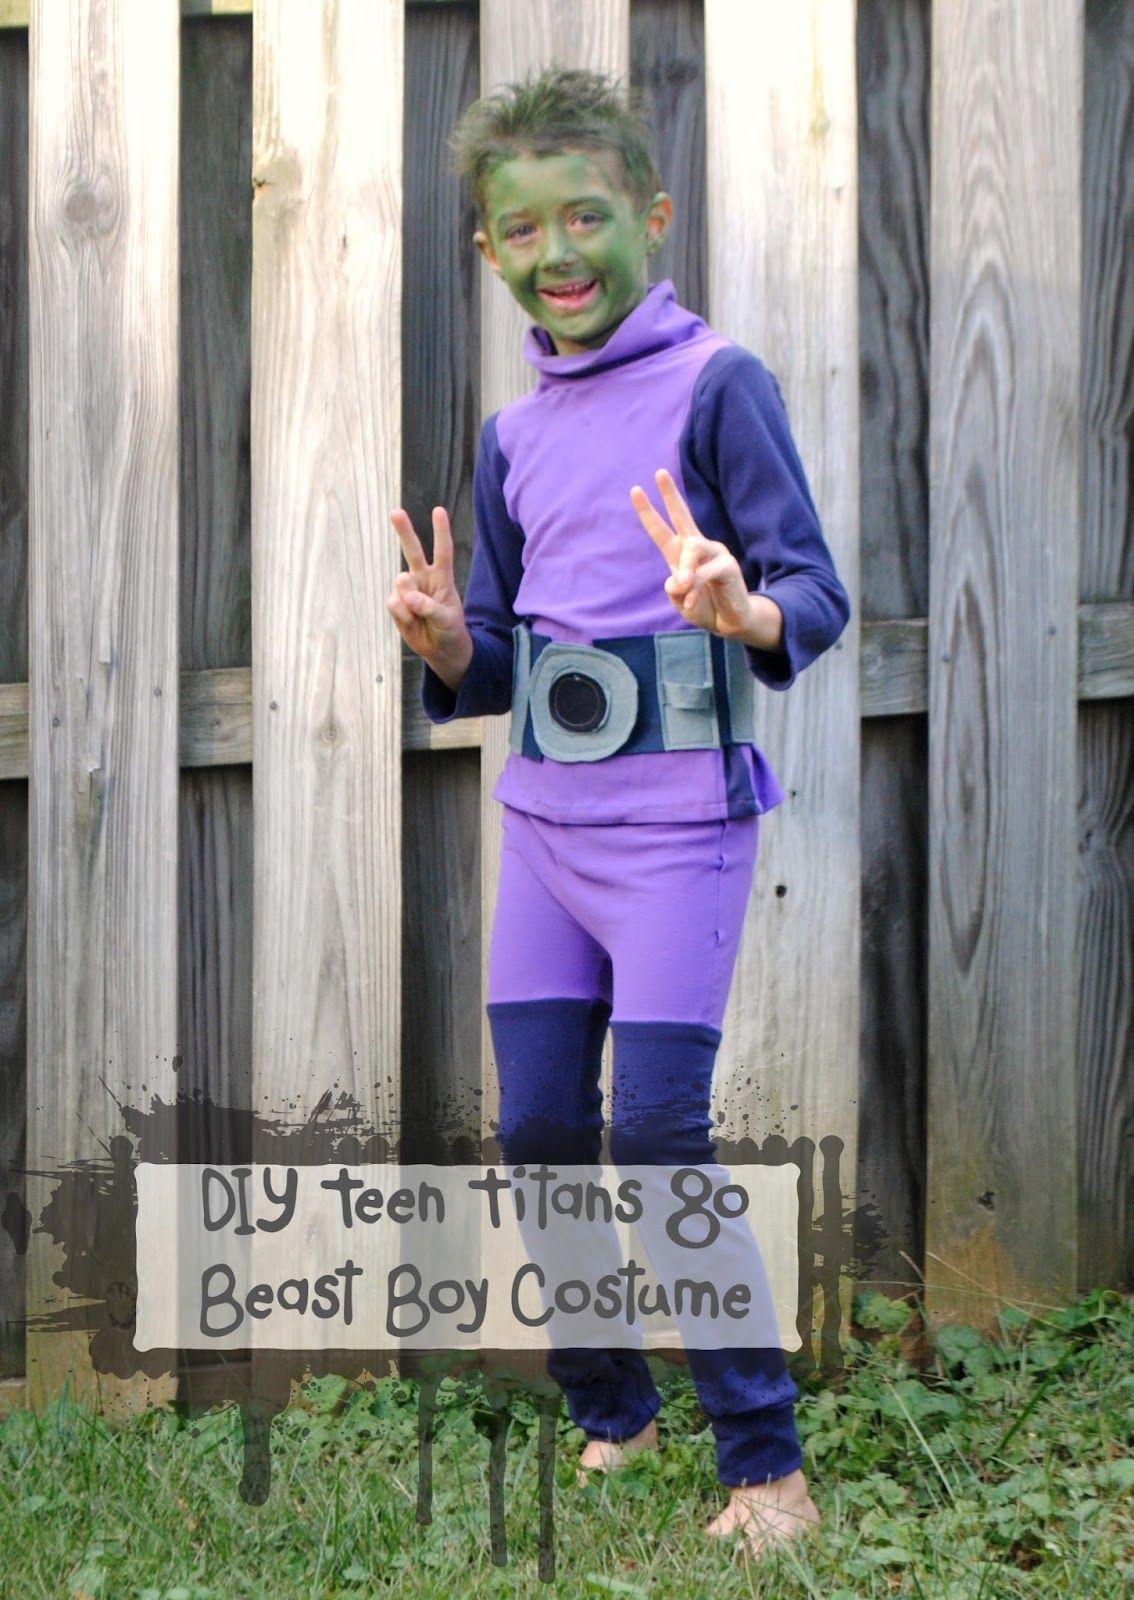 teen titans go- diy beast boy costume | halloween in 2018